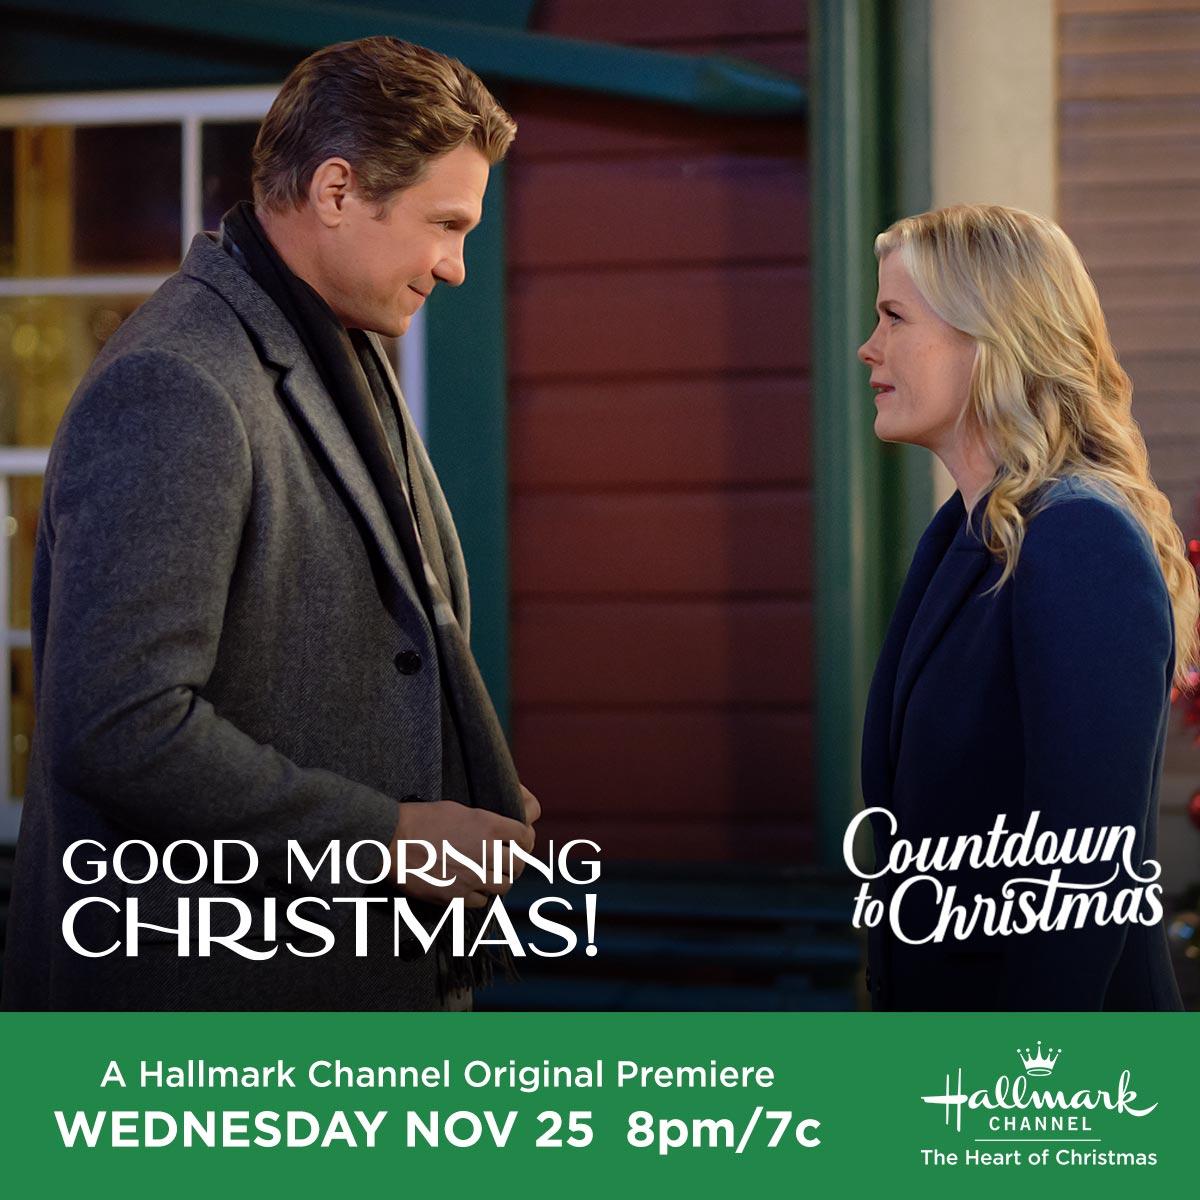 Good Morning Christmas Hallmark Channel